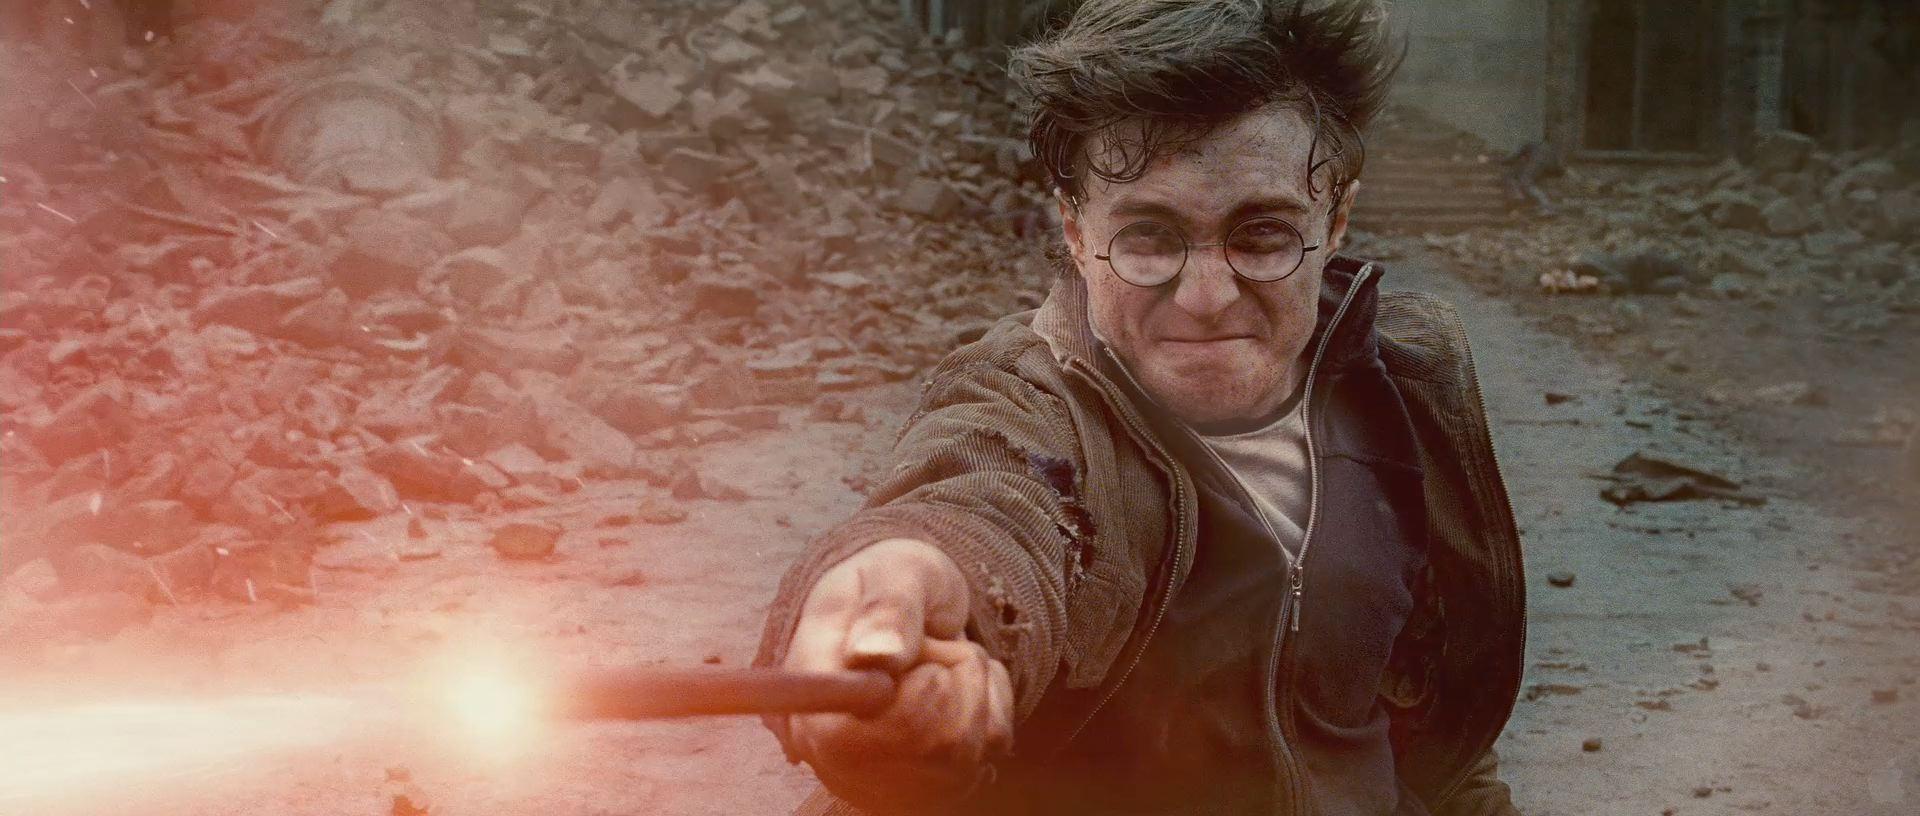 Harry Potter BlogHogwarts HP7 2 Trailer 86